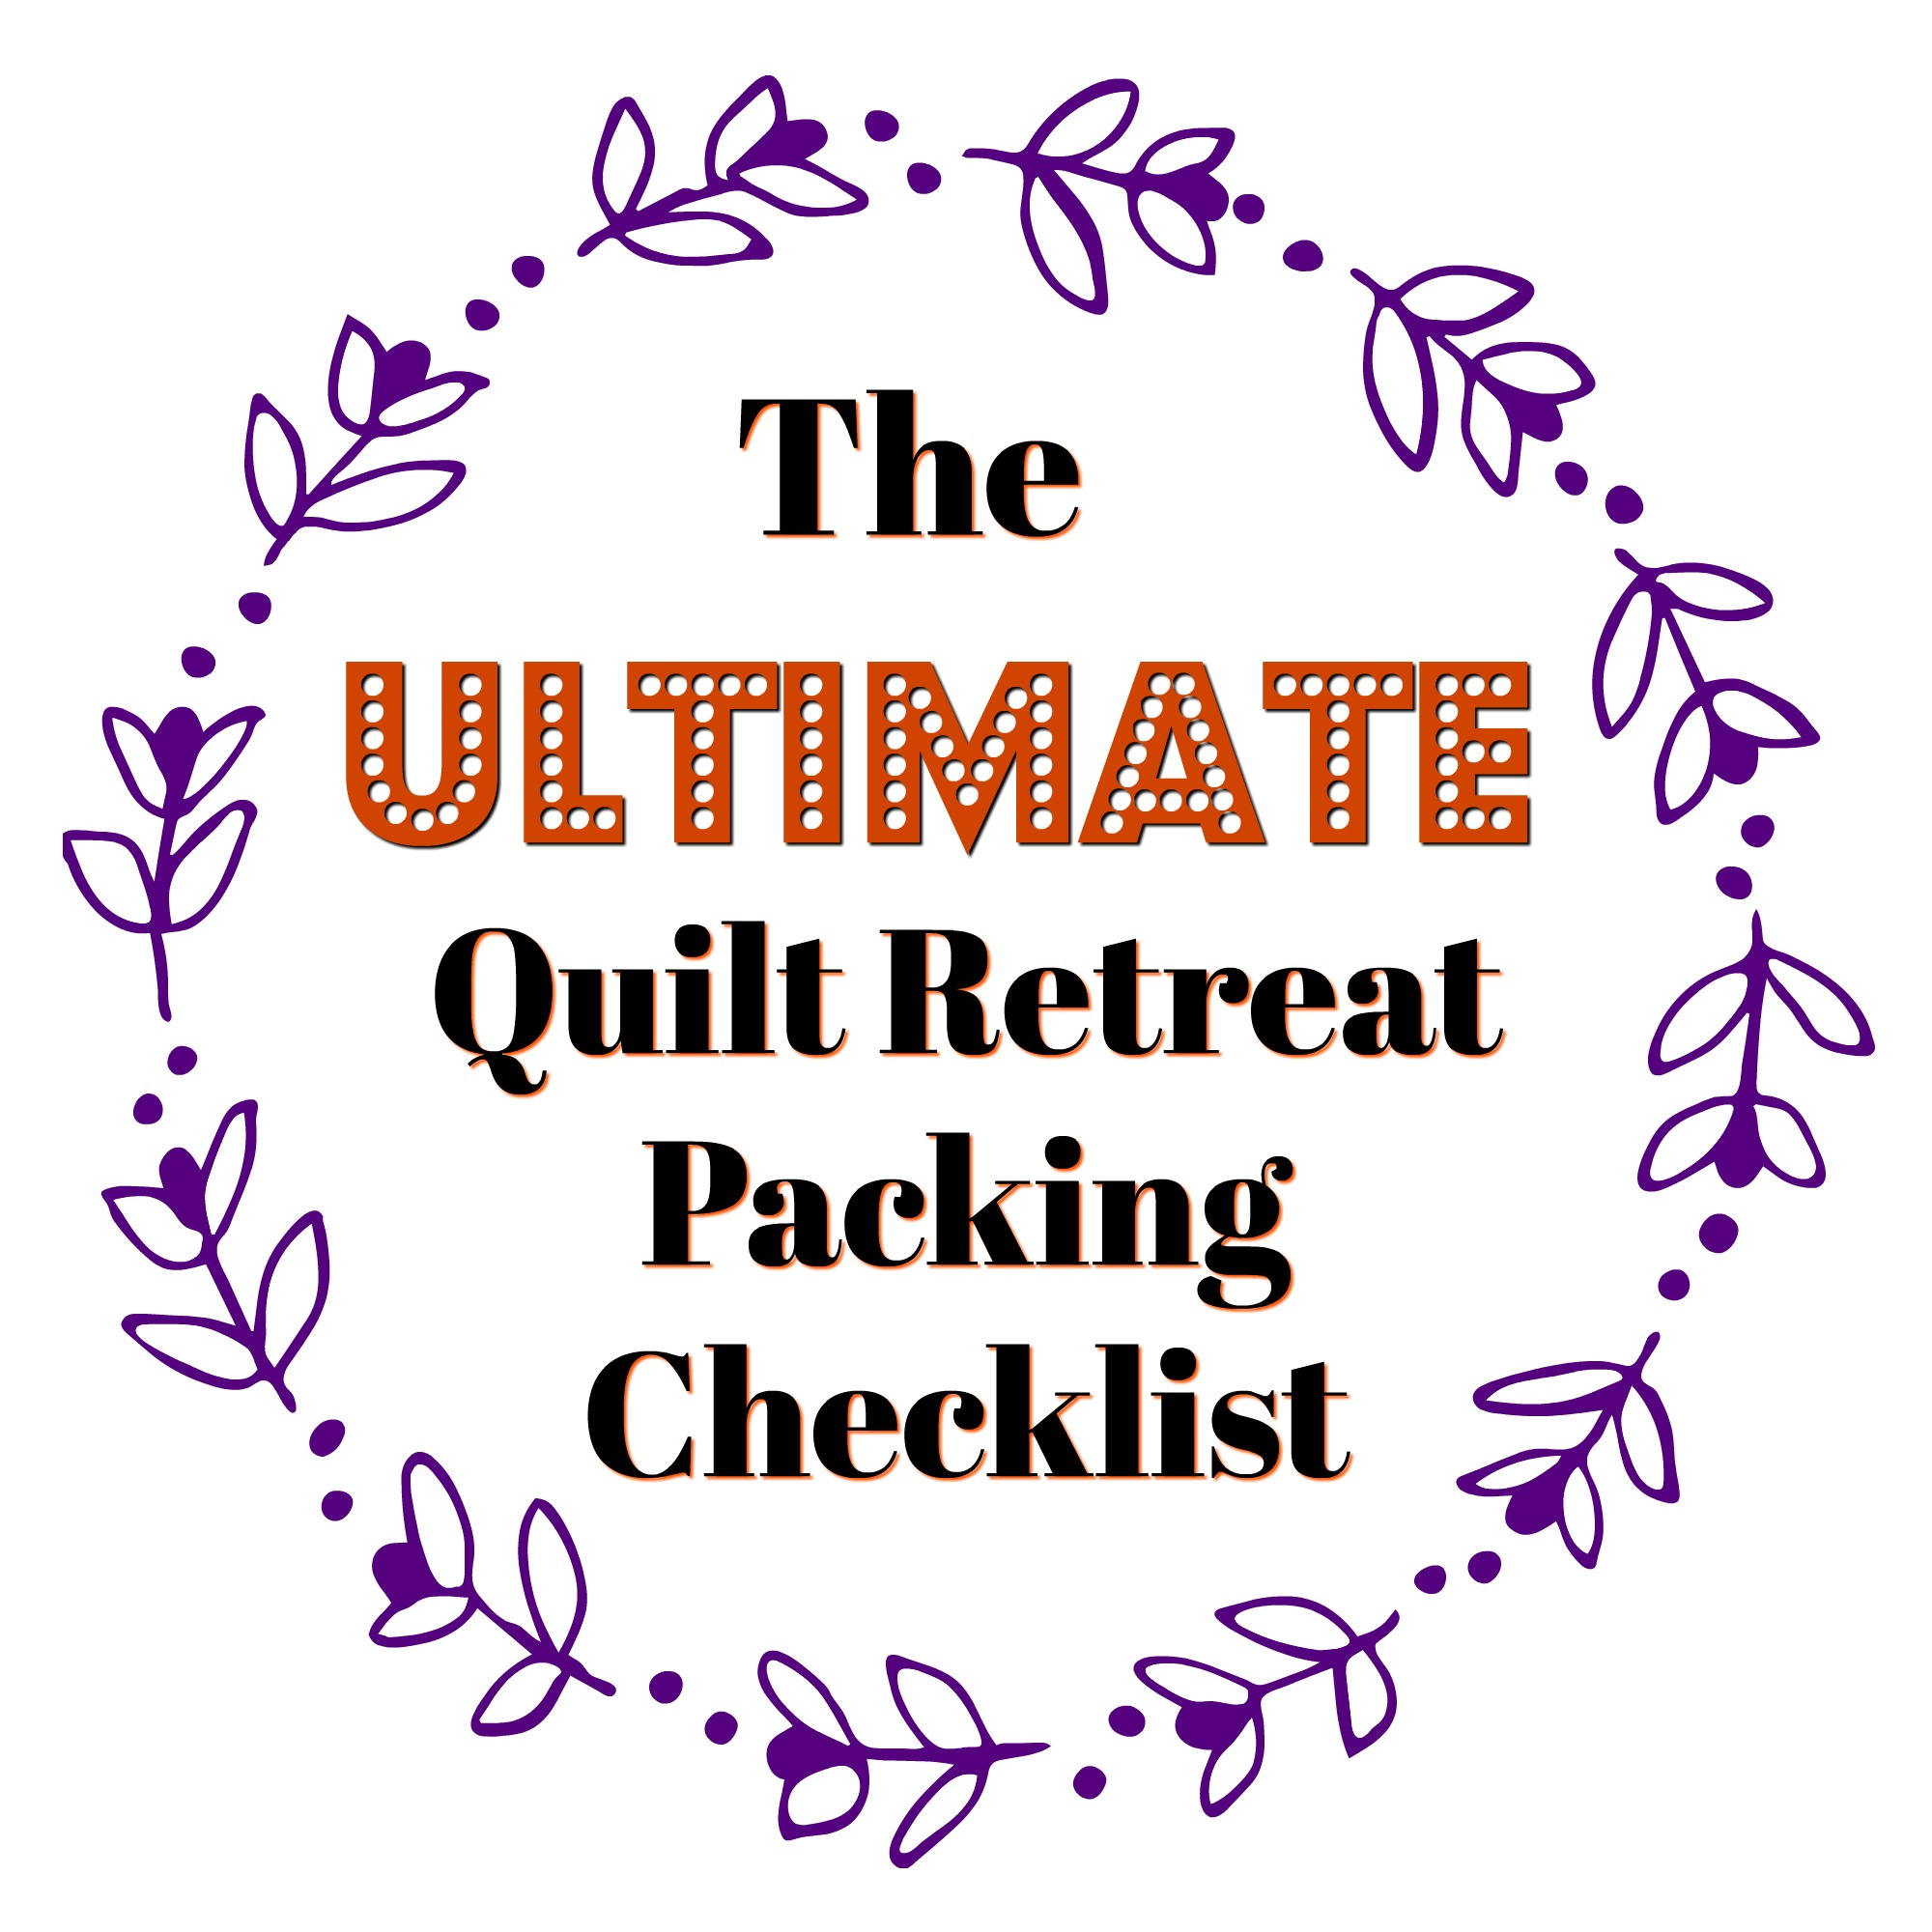 Quilt Retreat Packing Checklist